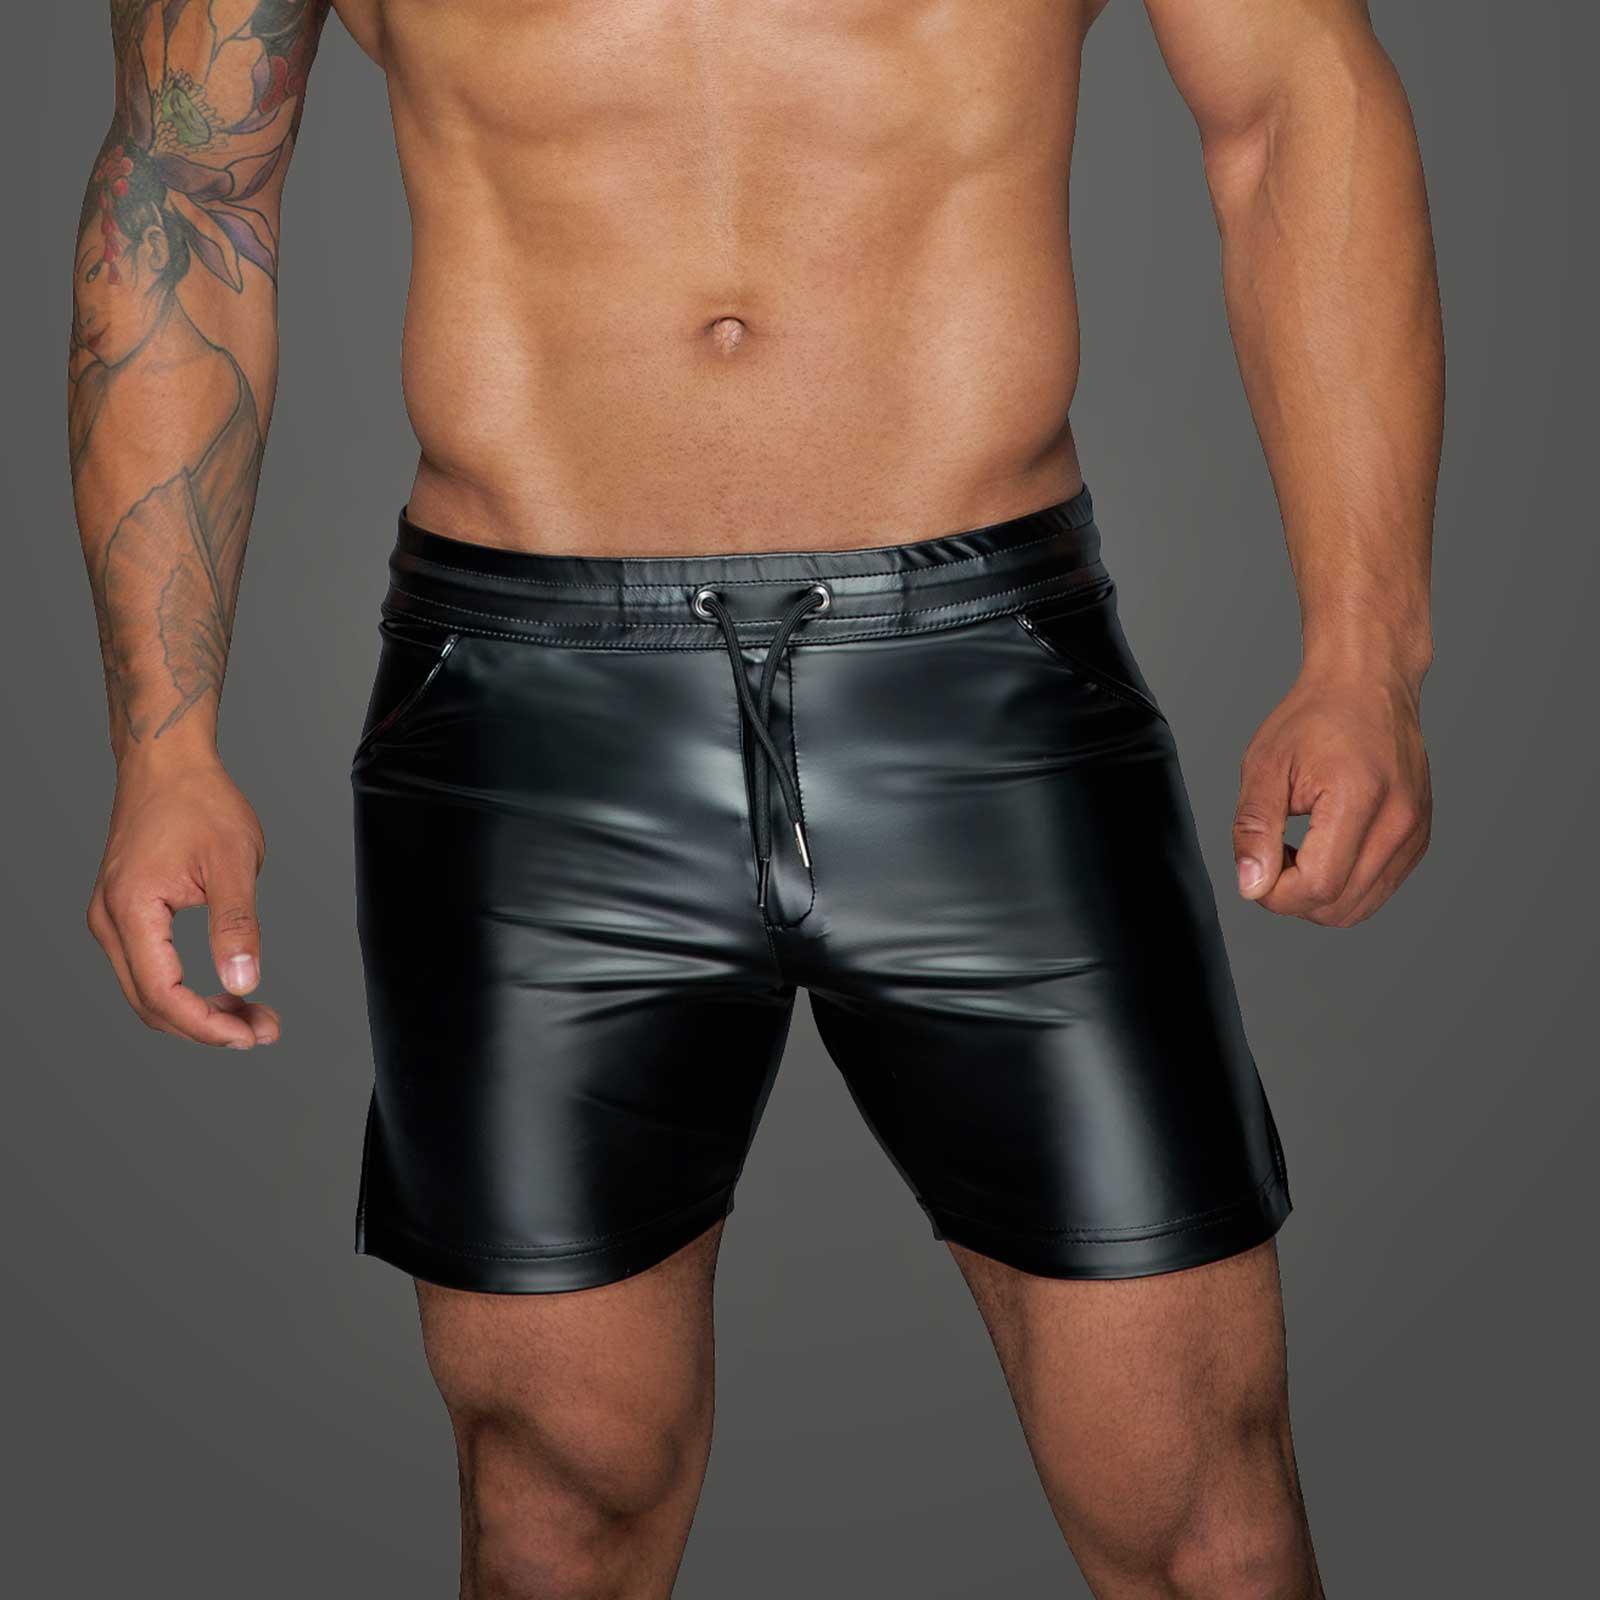 NOIR HANDMADE Wetlook Shorts